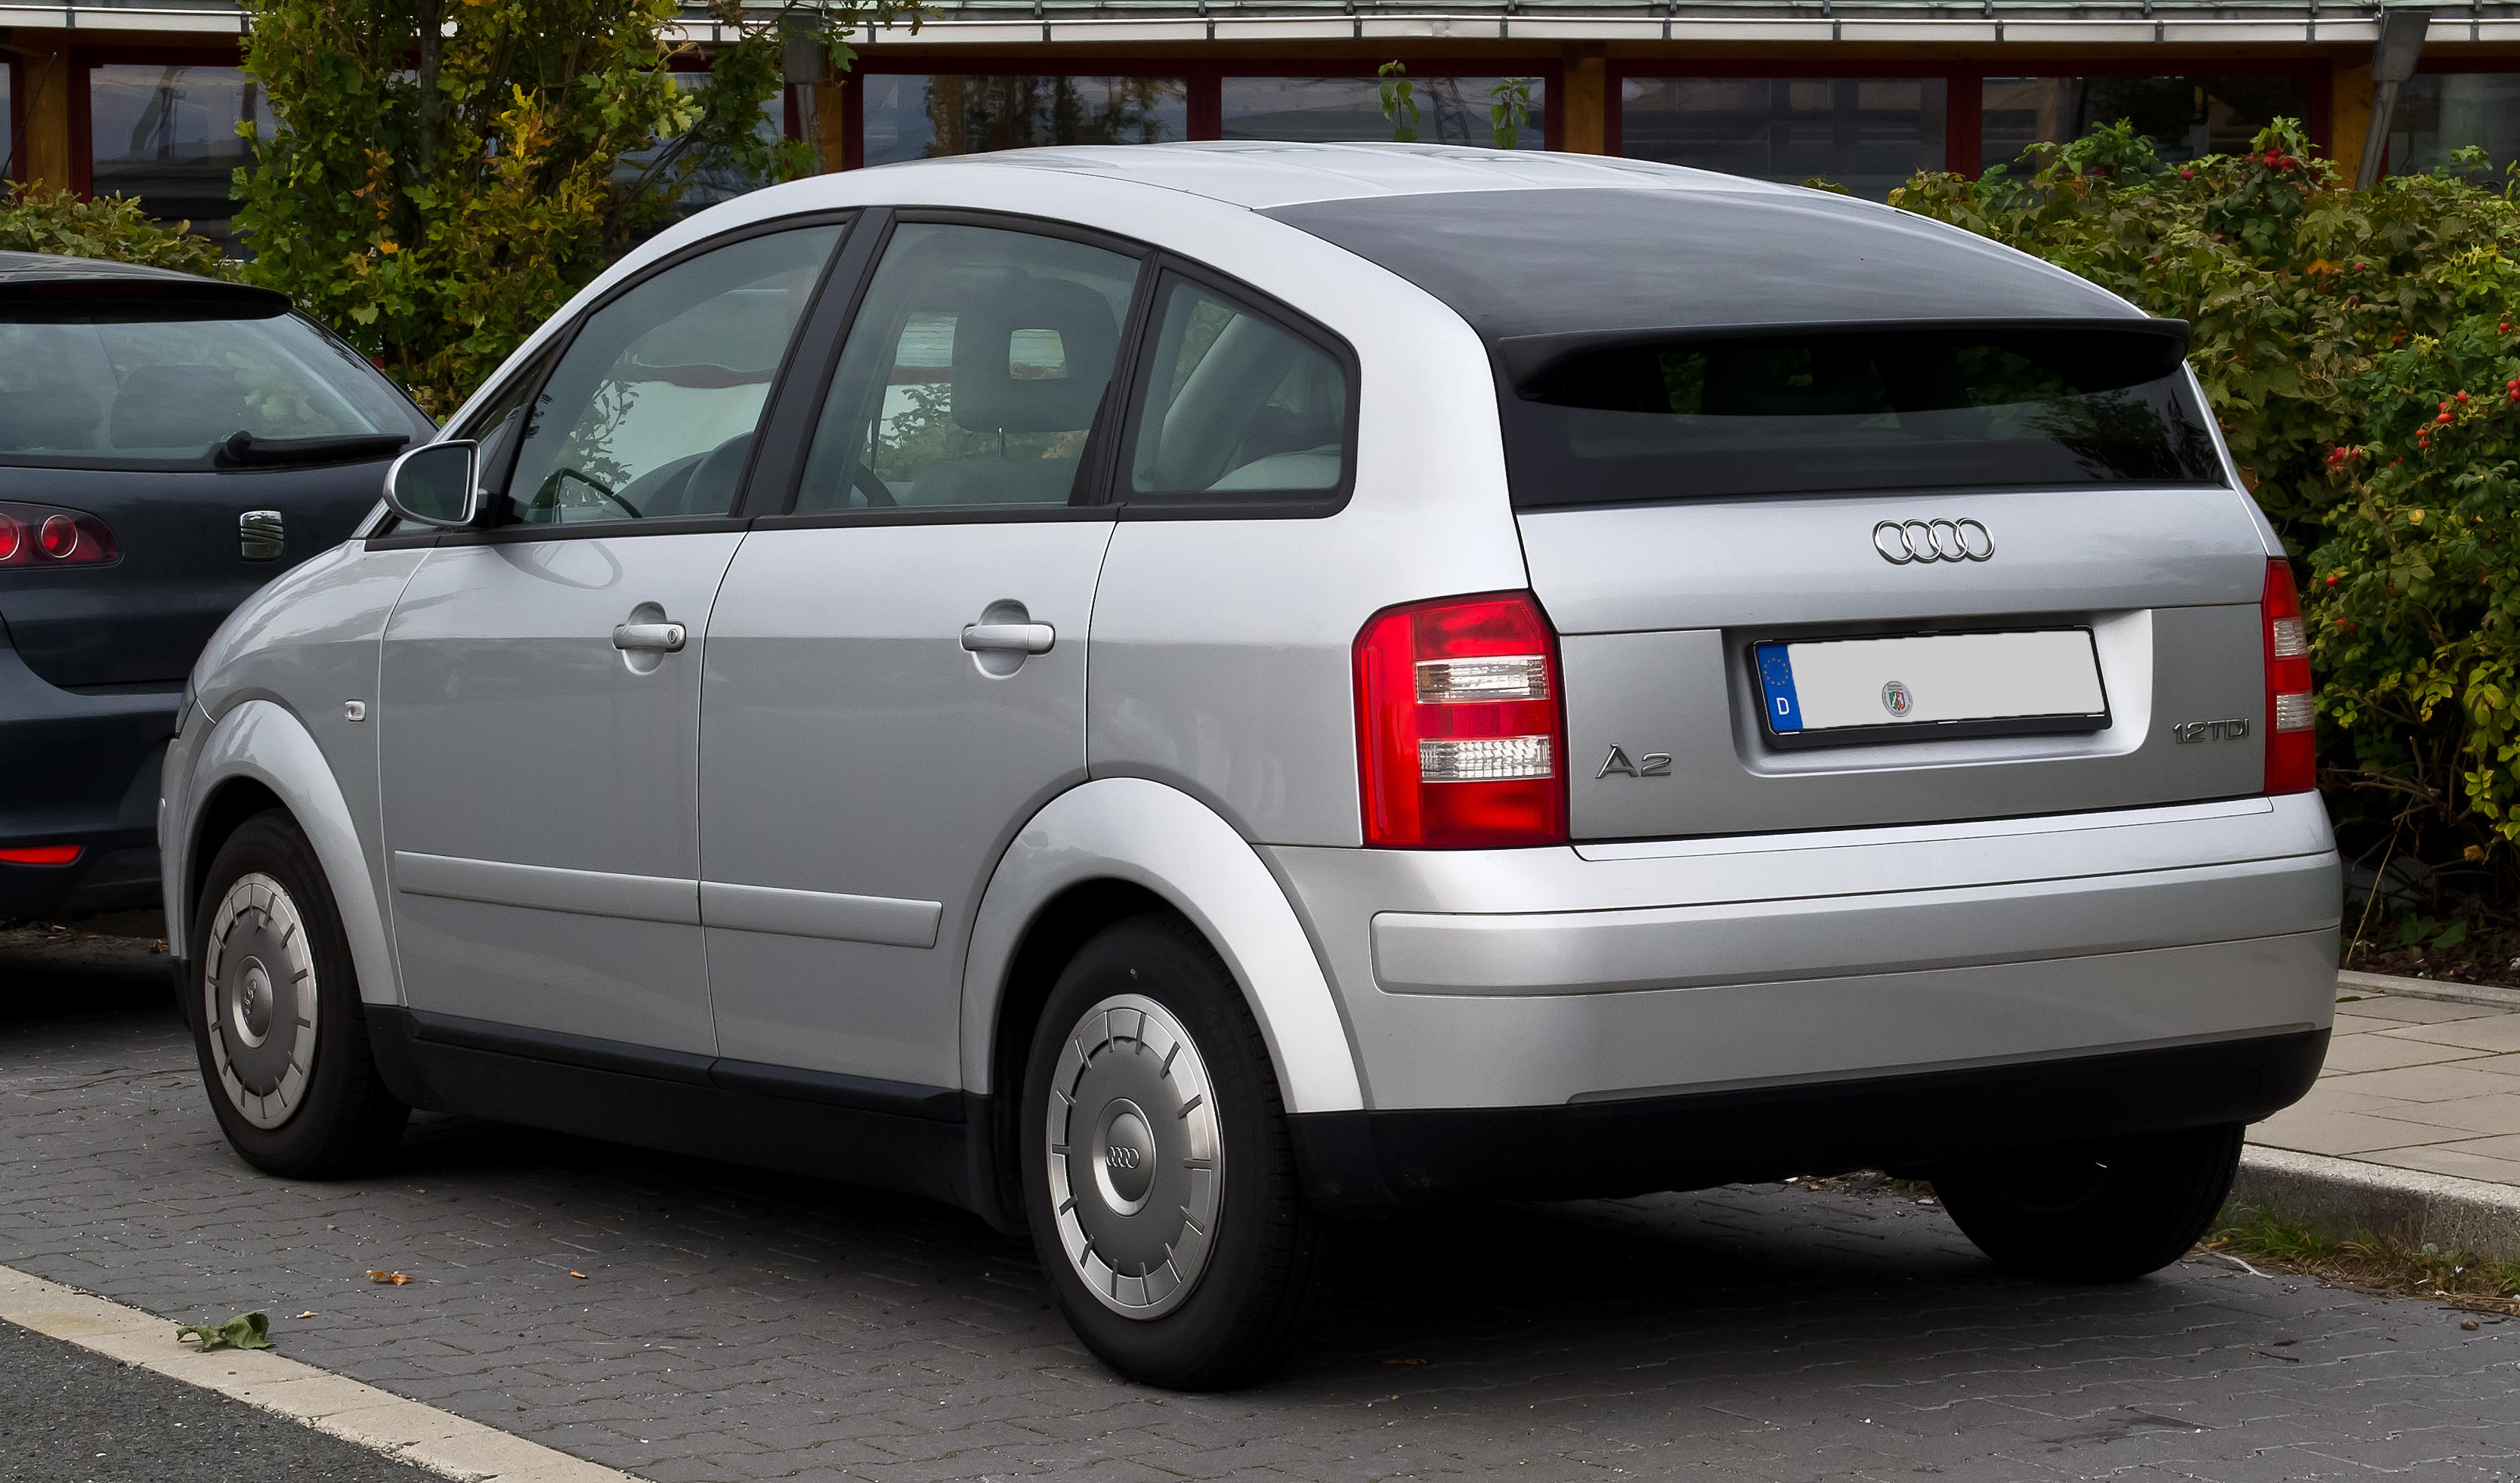 File Audi A2 1 2 Tdi Heckansicht 23 September 2012